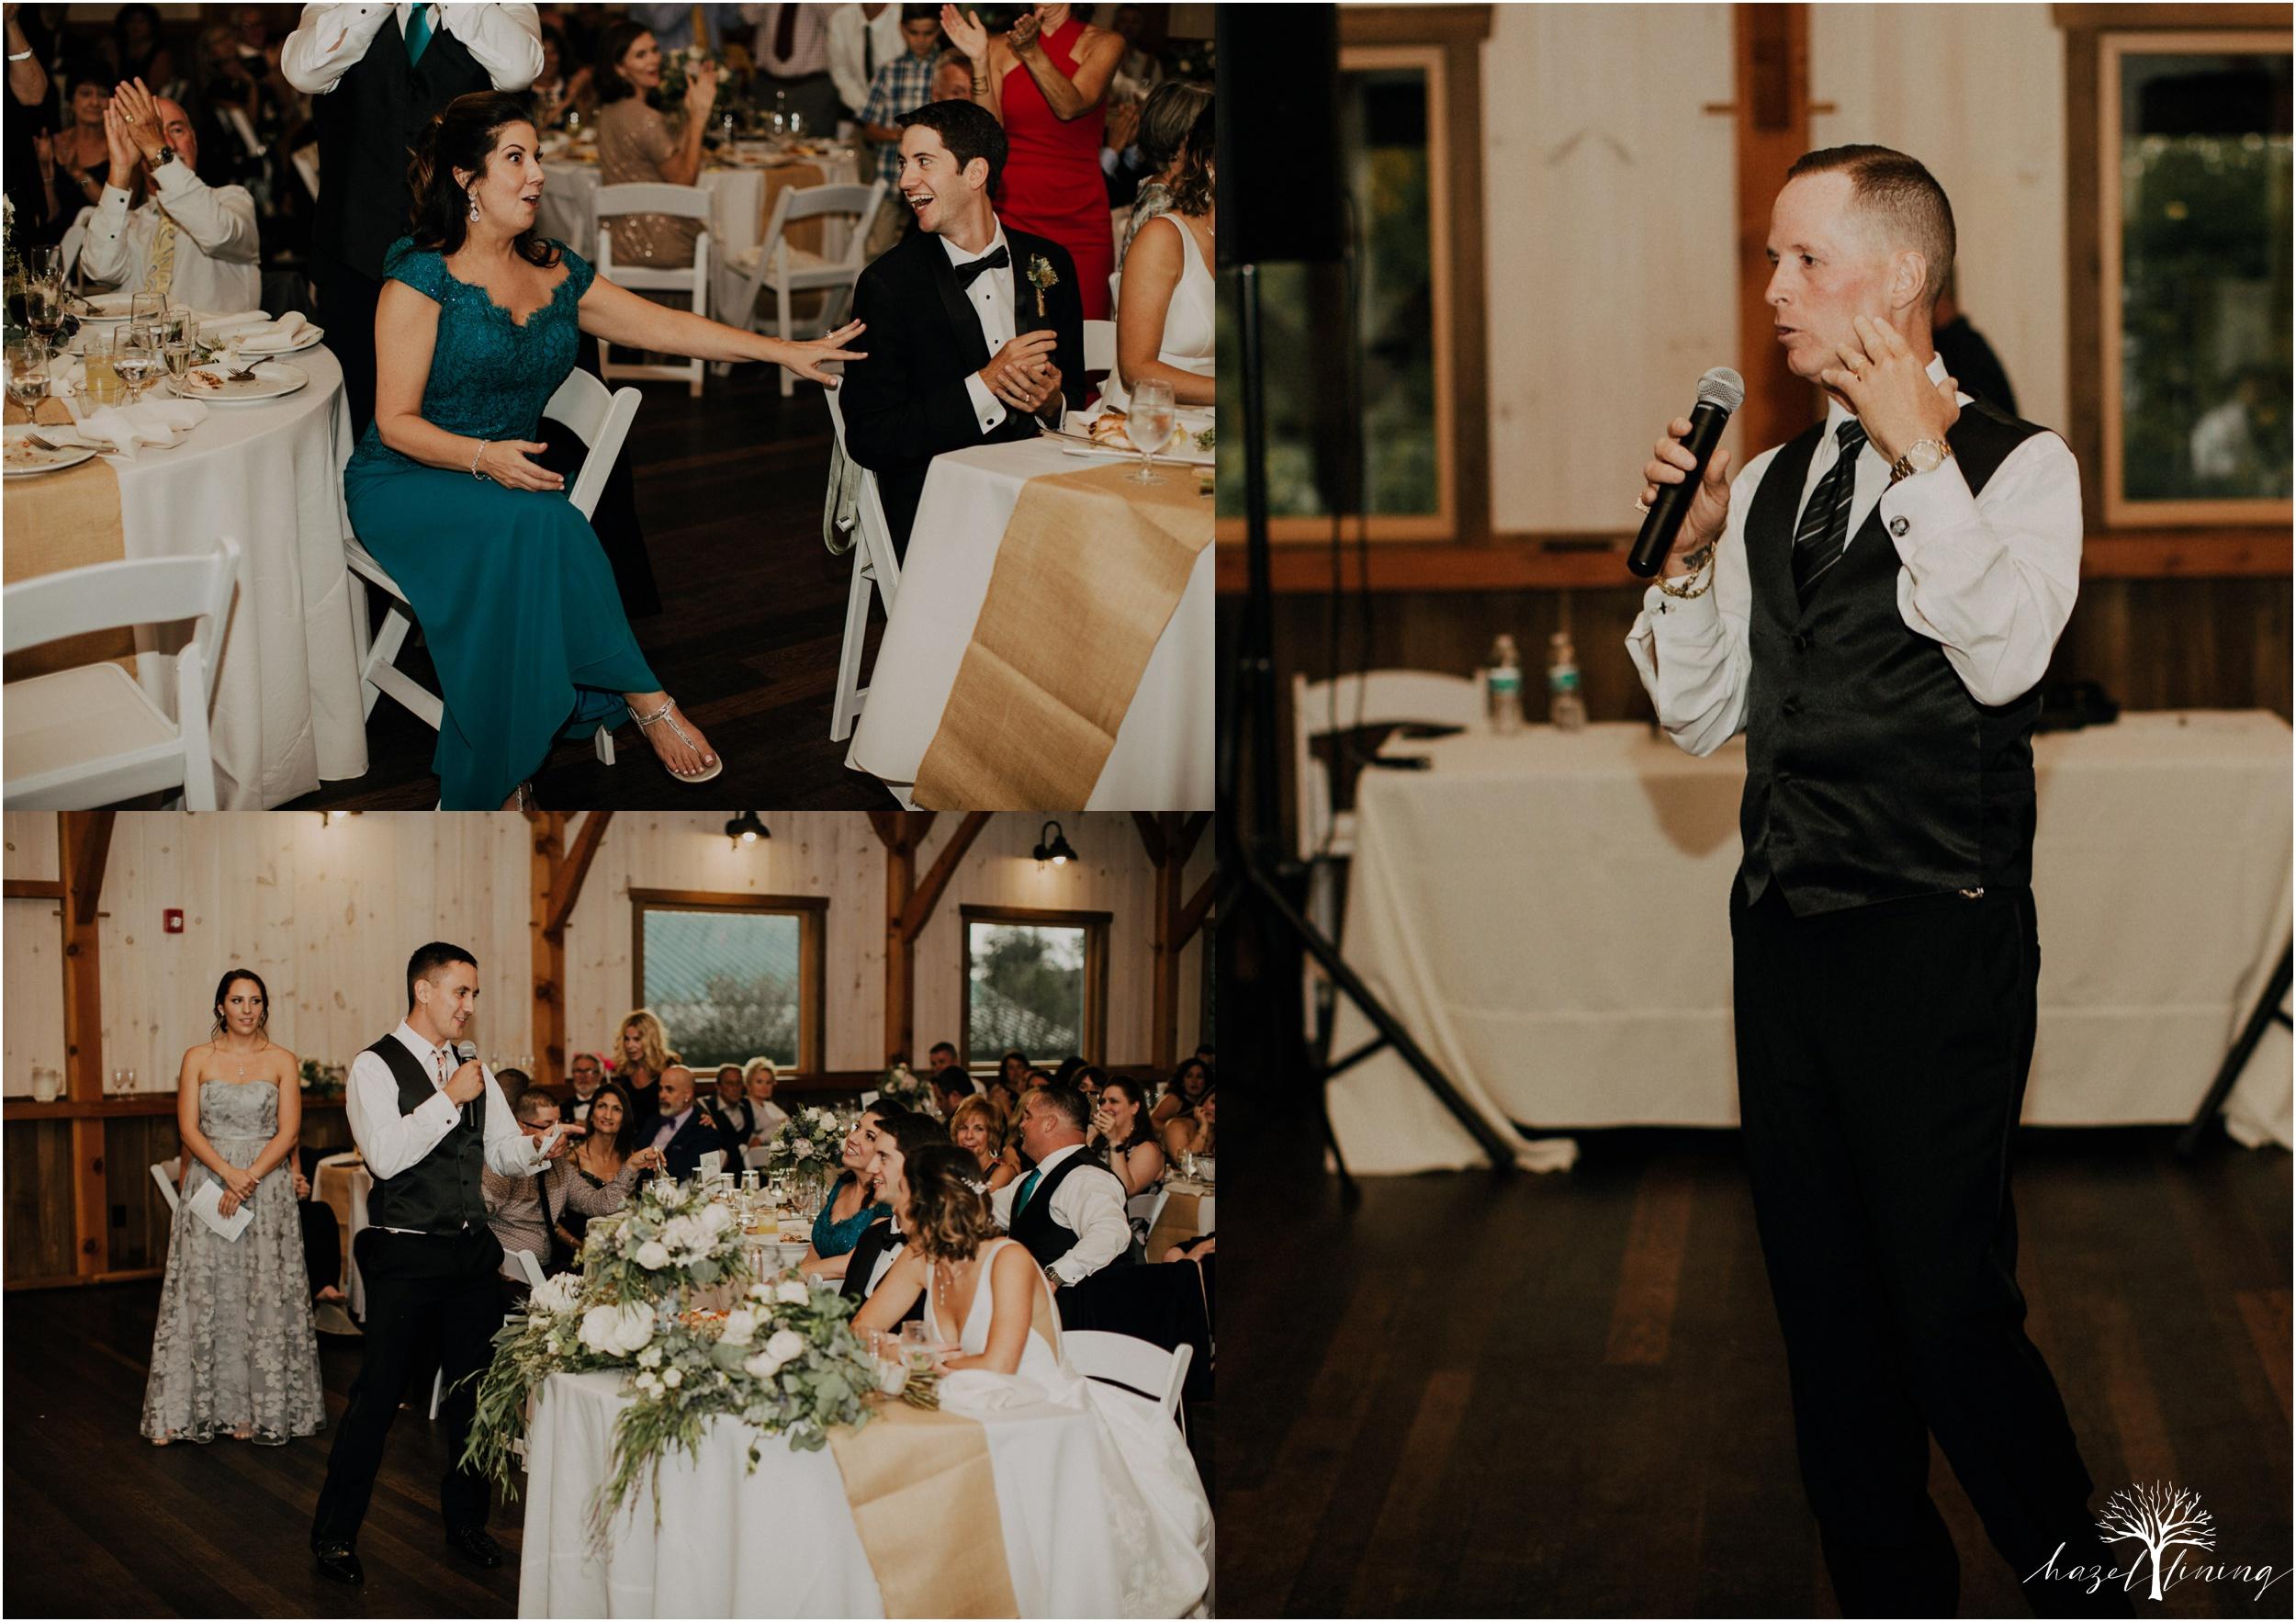 maureen-hepner-anthony-giordano-rose-bank-winery-newtow-pennsylvania-luxury-summer-wedding-hazel-lining-photography-destination-elopement-wedding-engagement-photography_0140.jpg